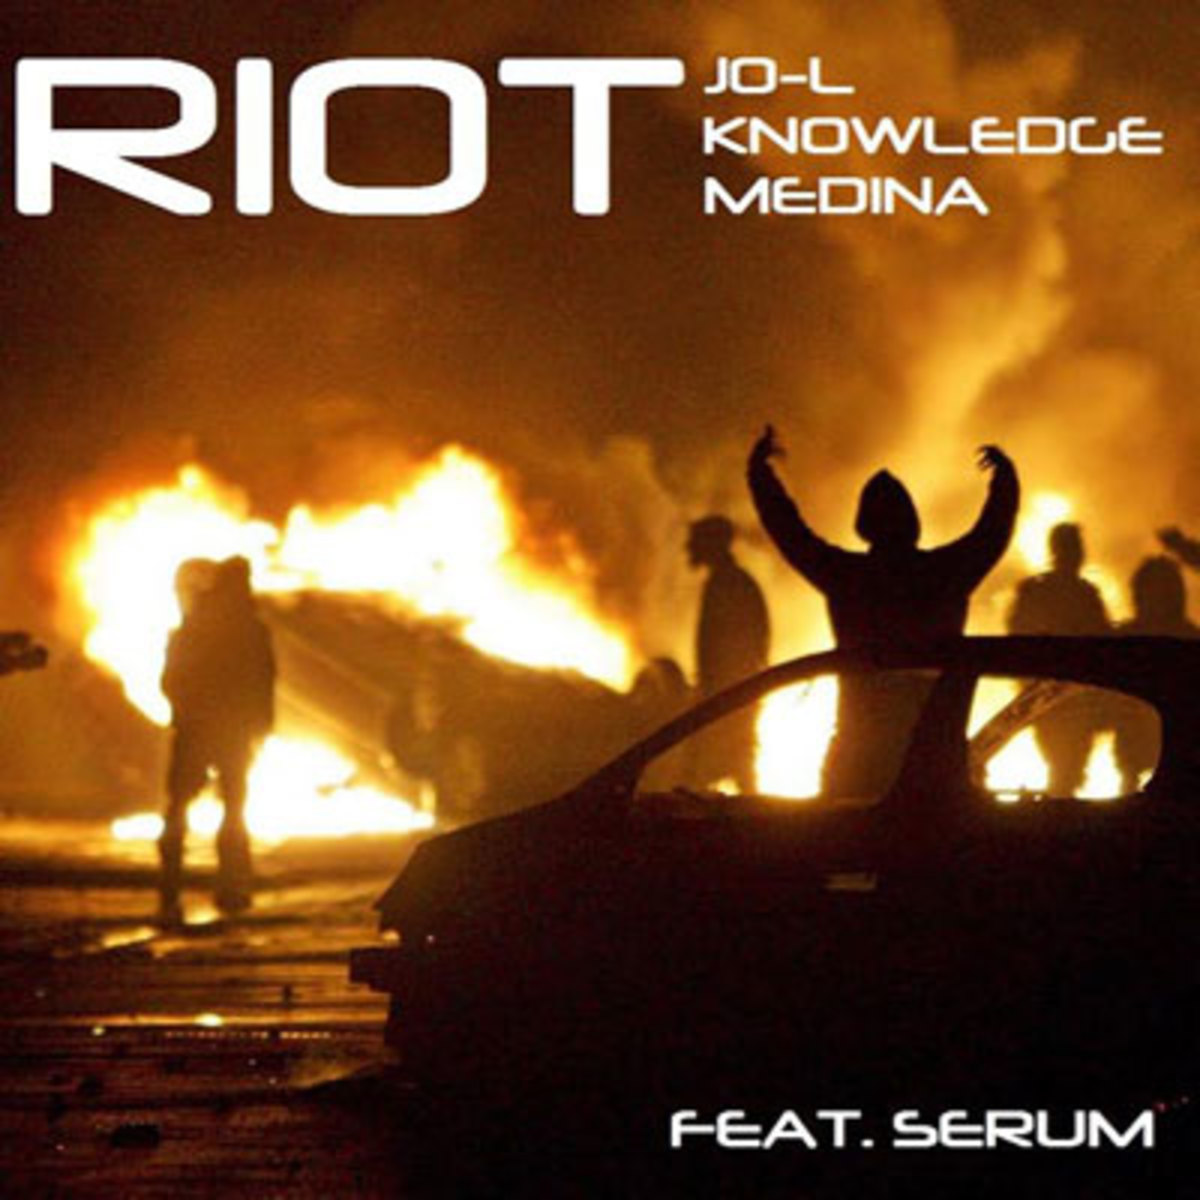 knowledgemedina-riot.jpg